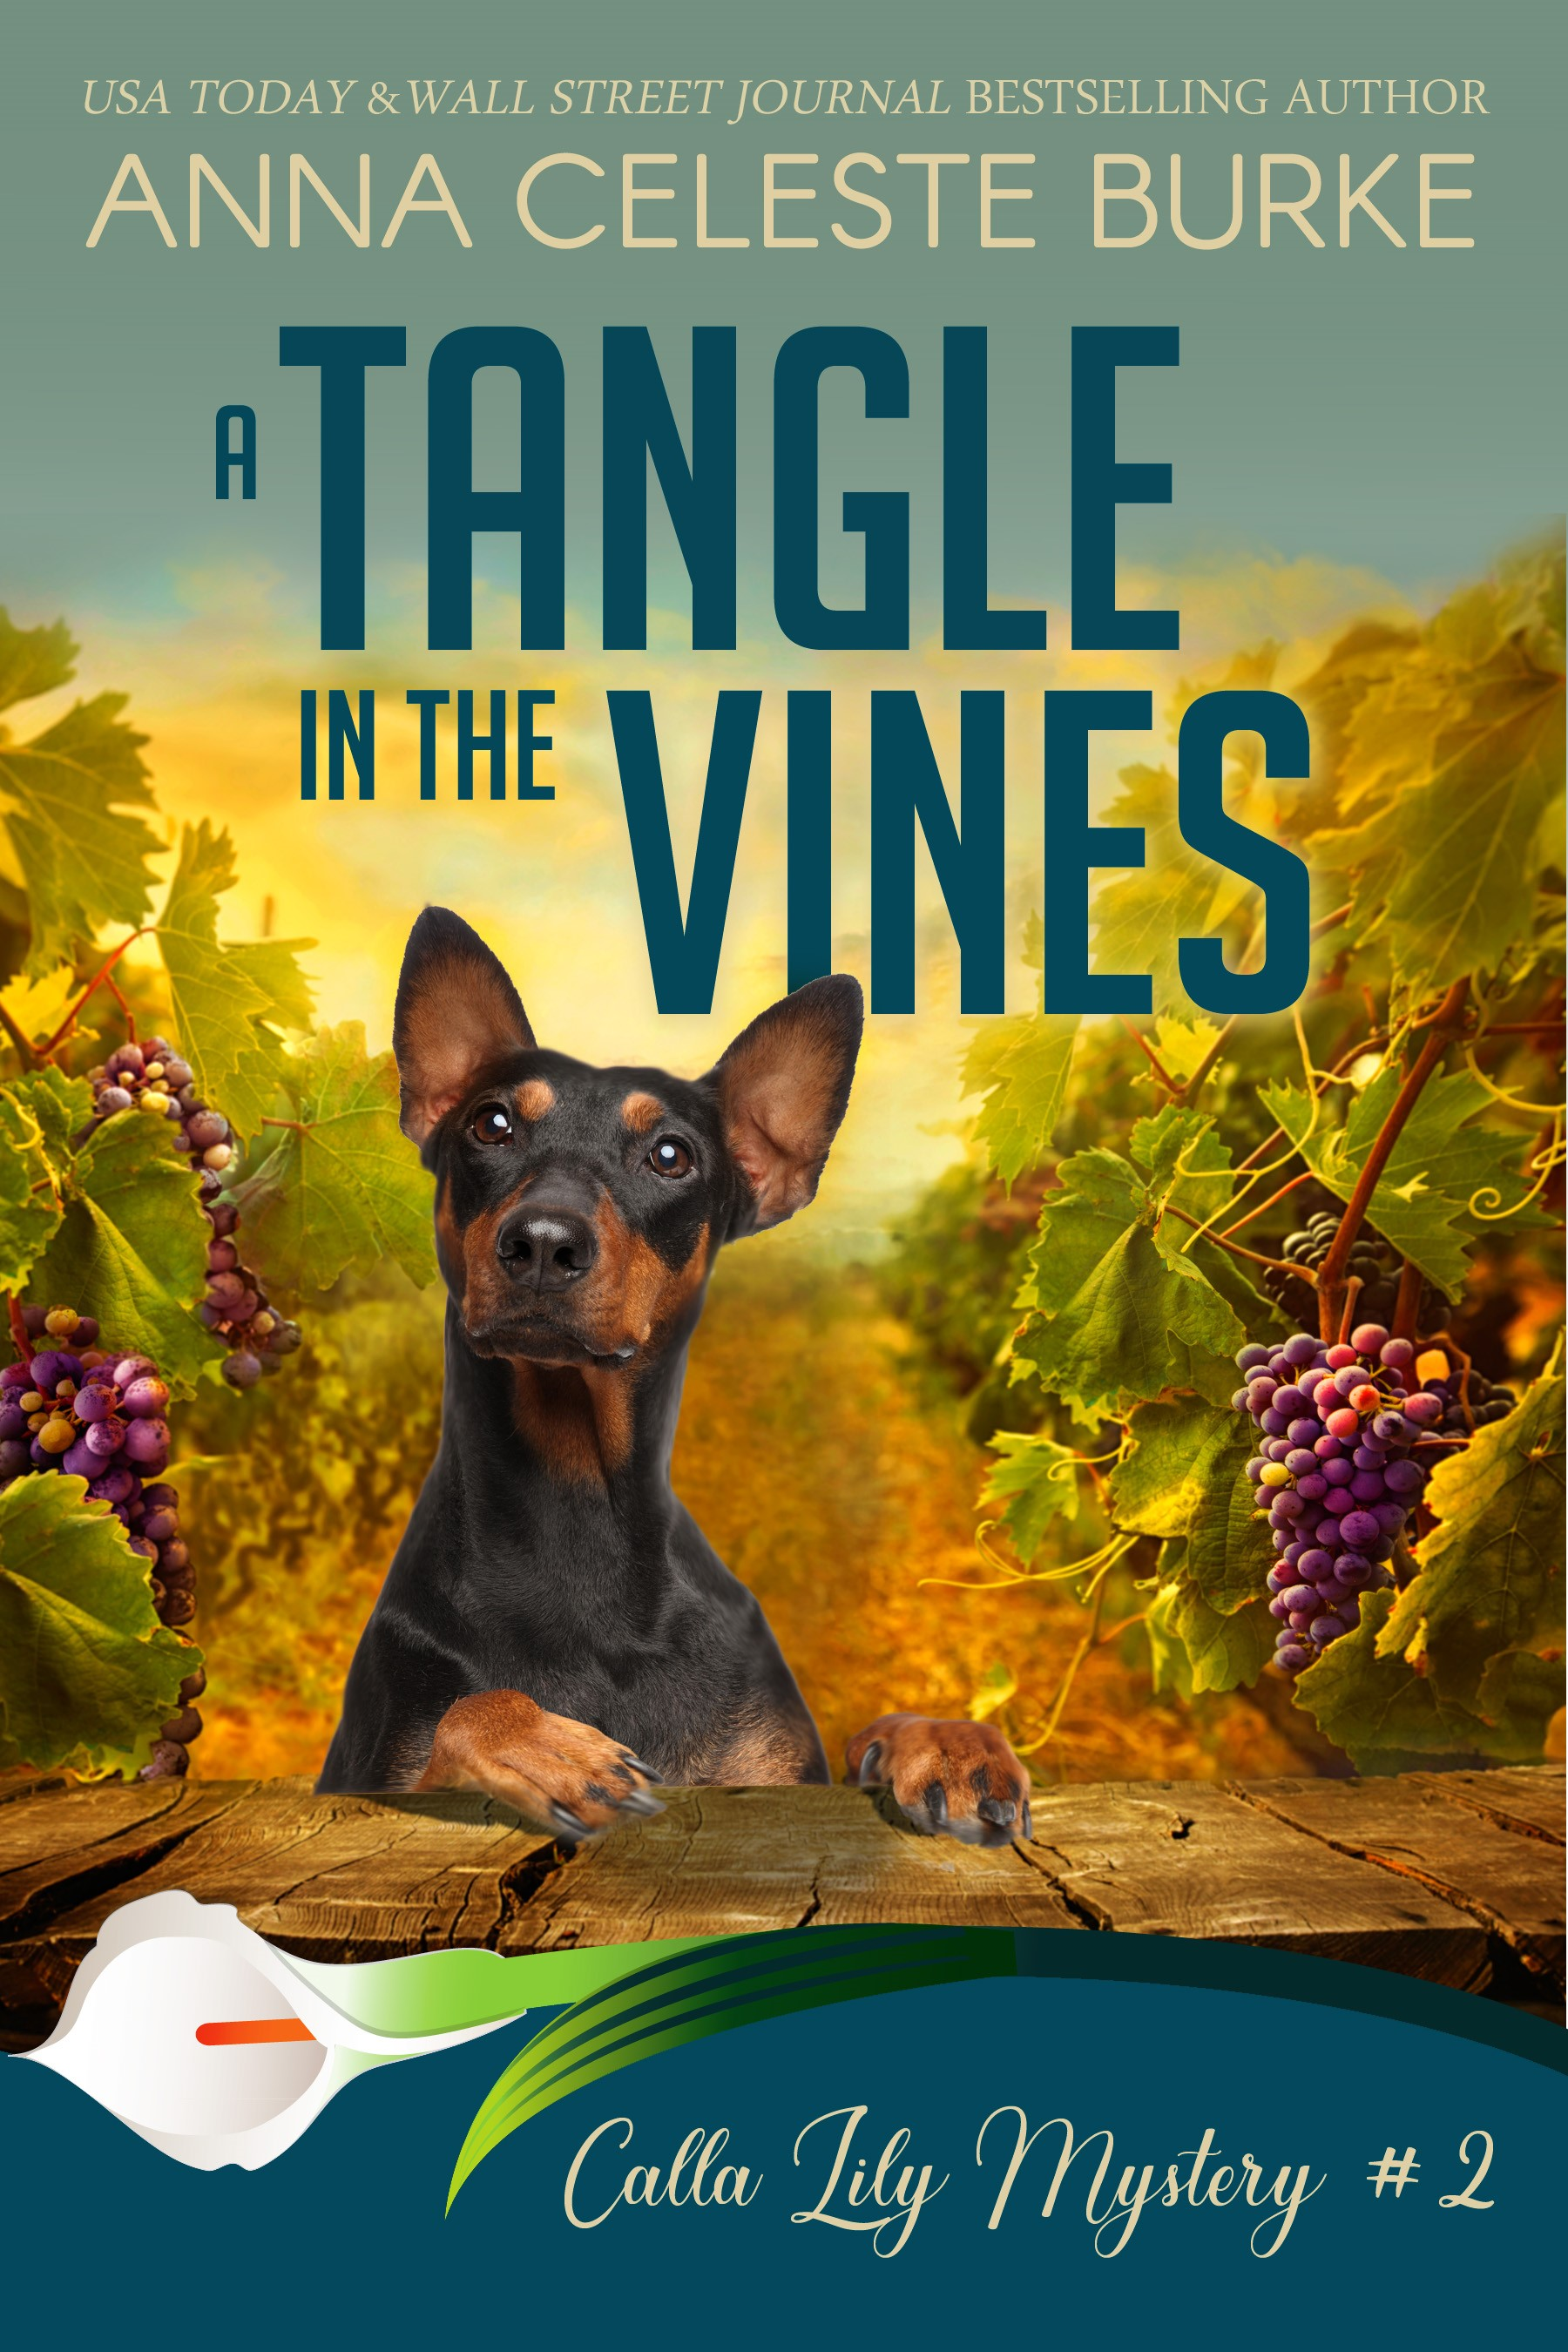 The Celeste: Tangled in Vines and Webbs